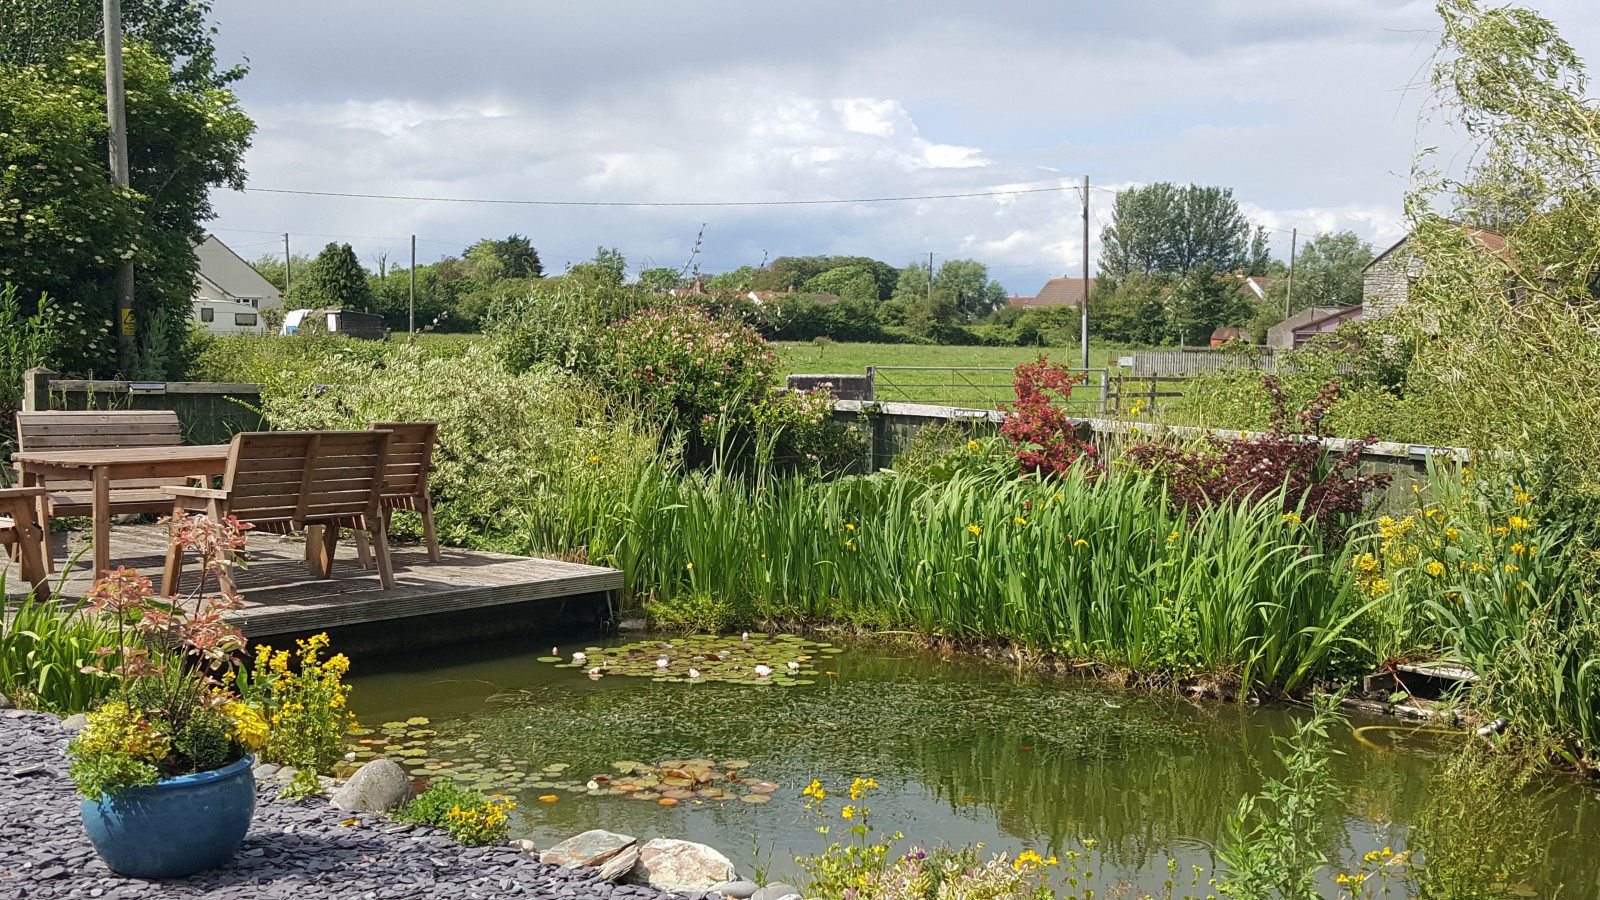 Beautiful Somerset koi pond, garden and farmland scenery